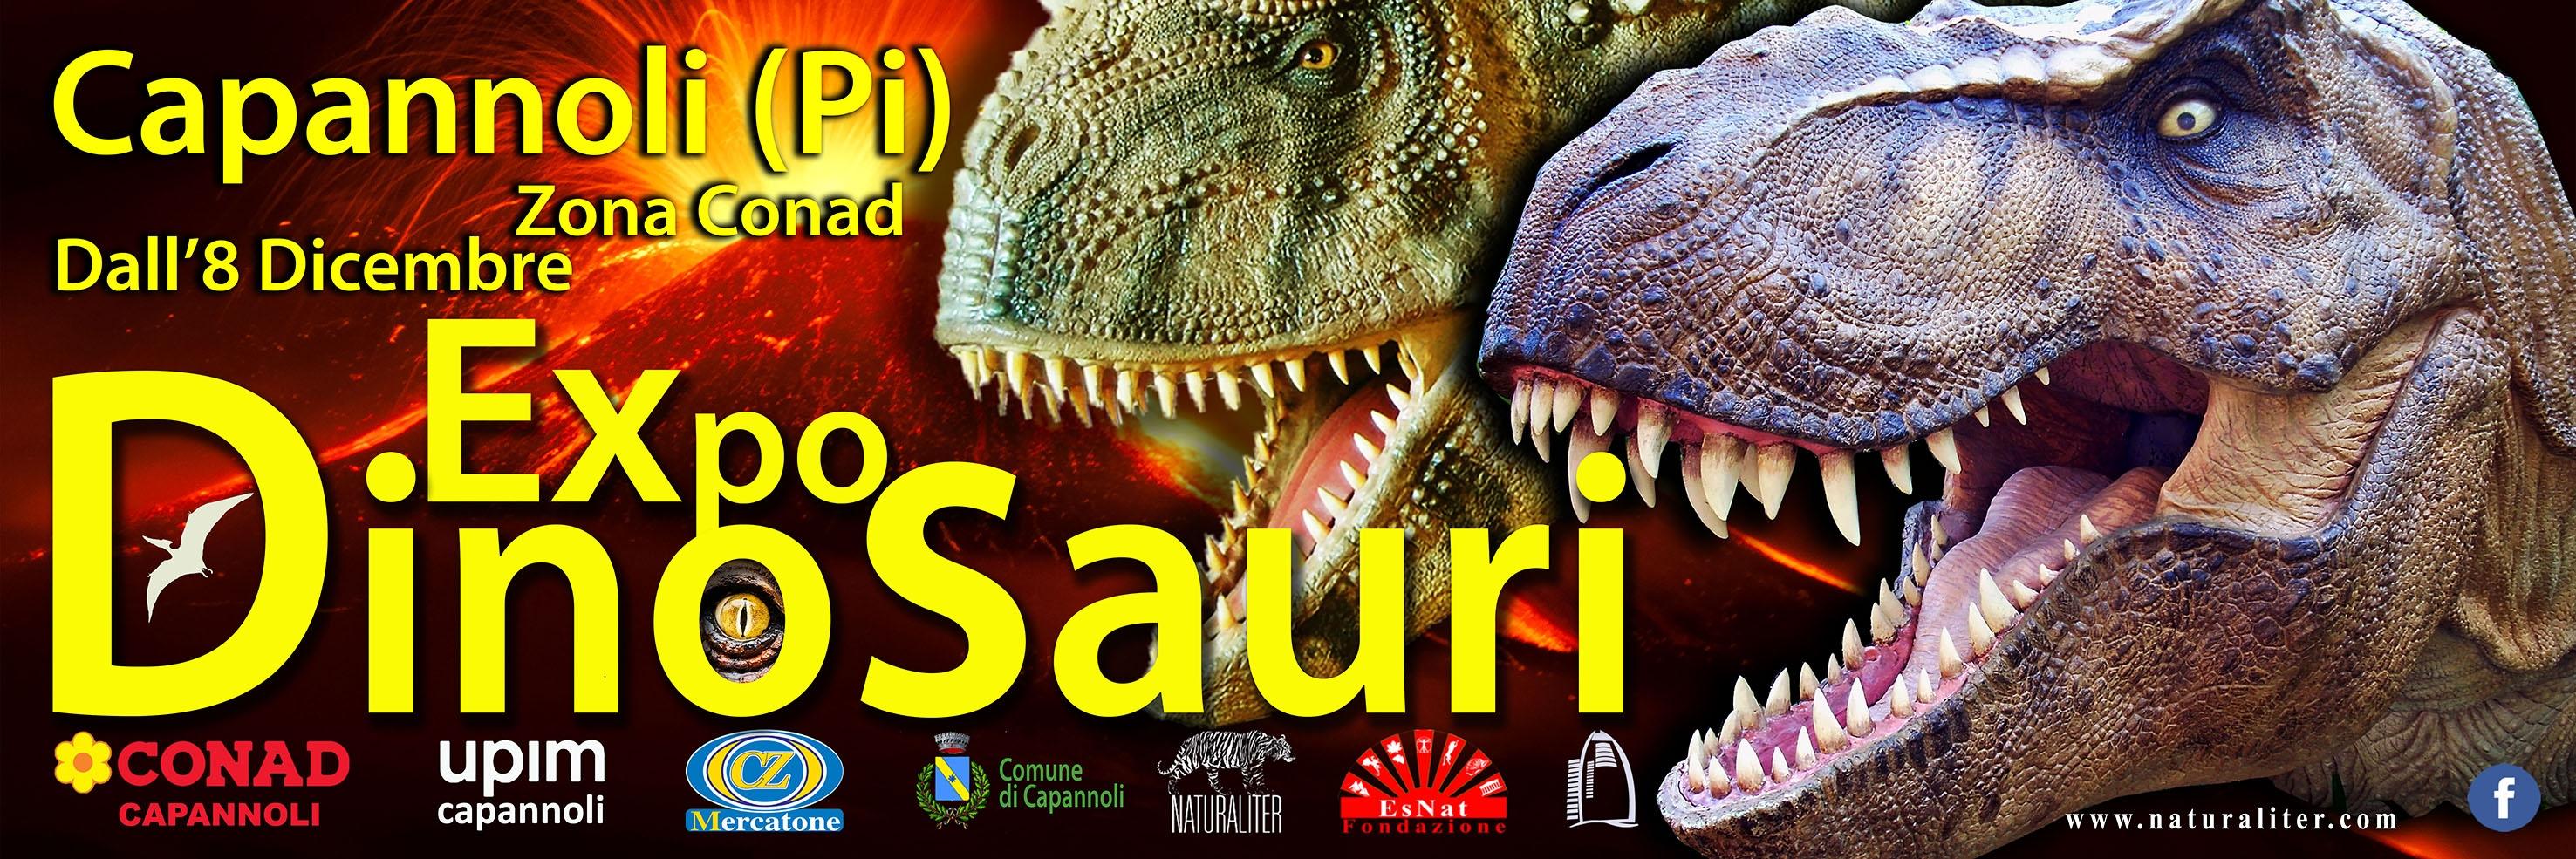 Expo dinosauri a Capannoli